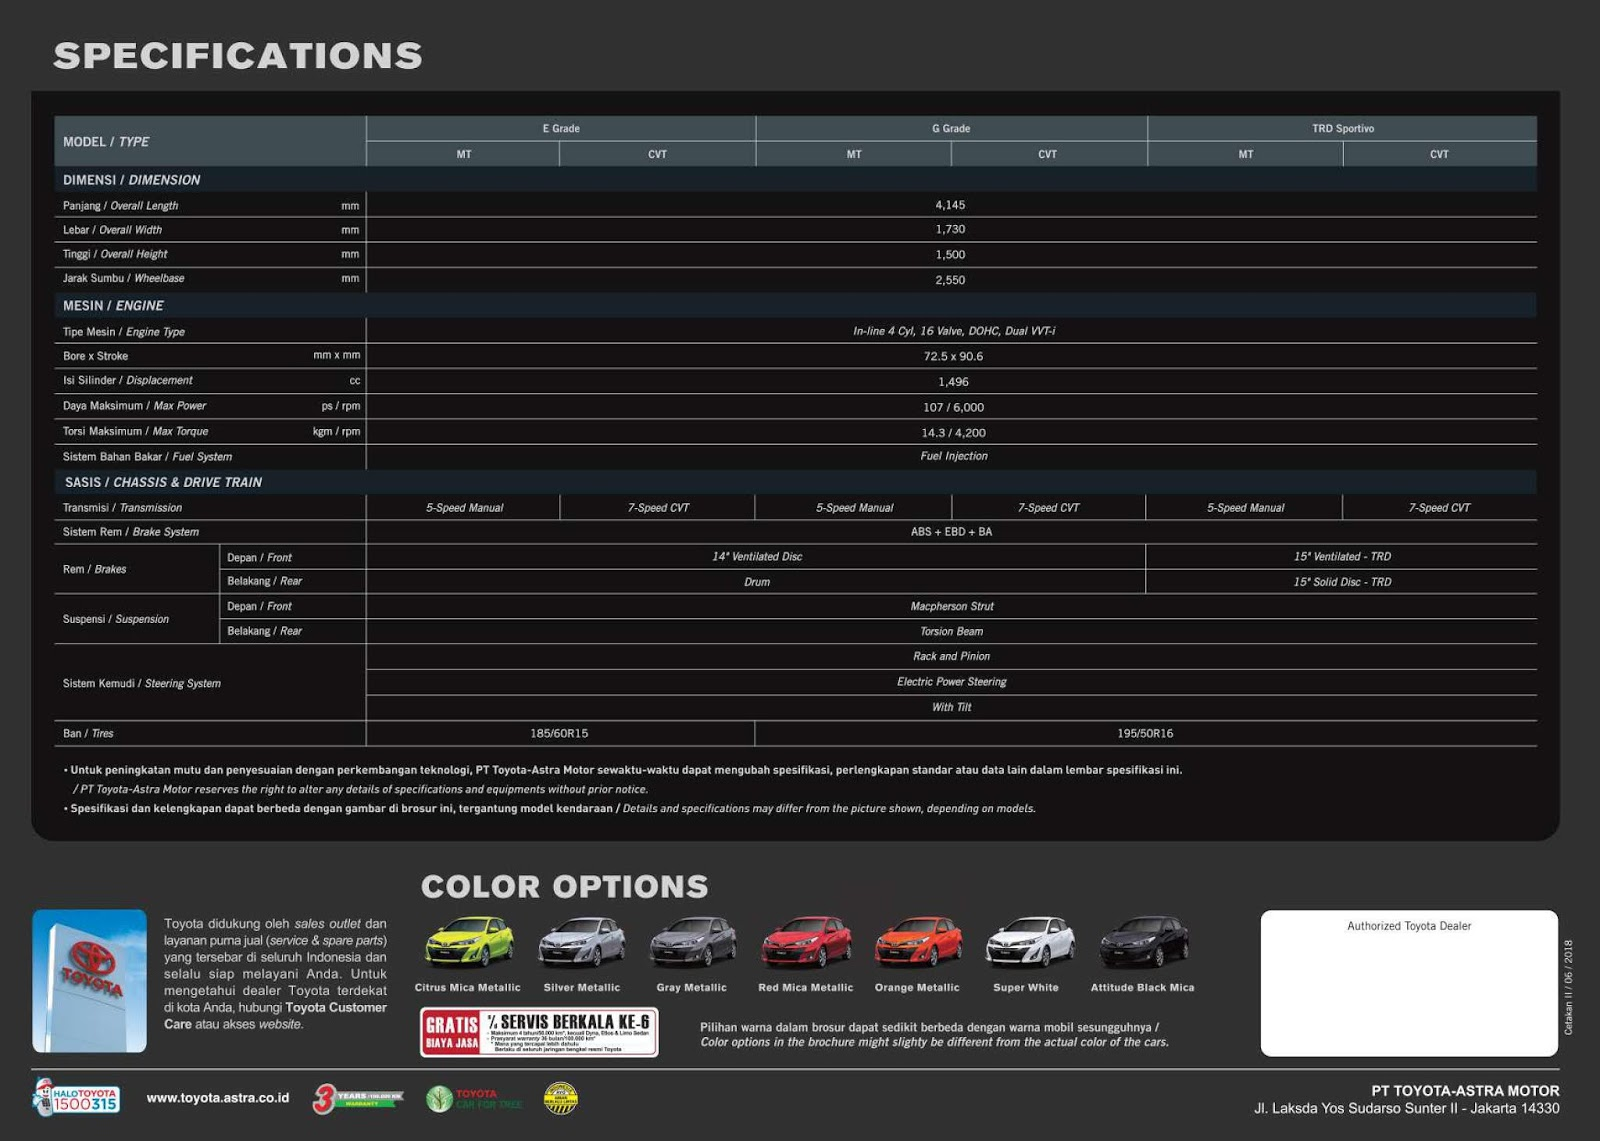 New Yaris - Info Spesifikasi, harga Toyota Yaris Bali, promo Toyota Yaris Bali 6